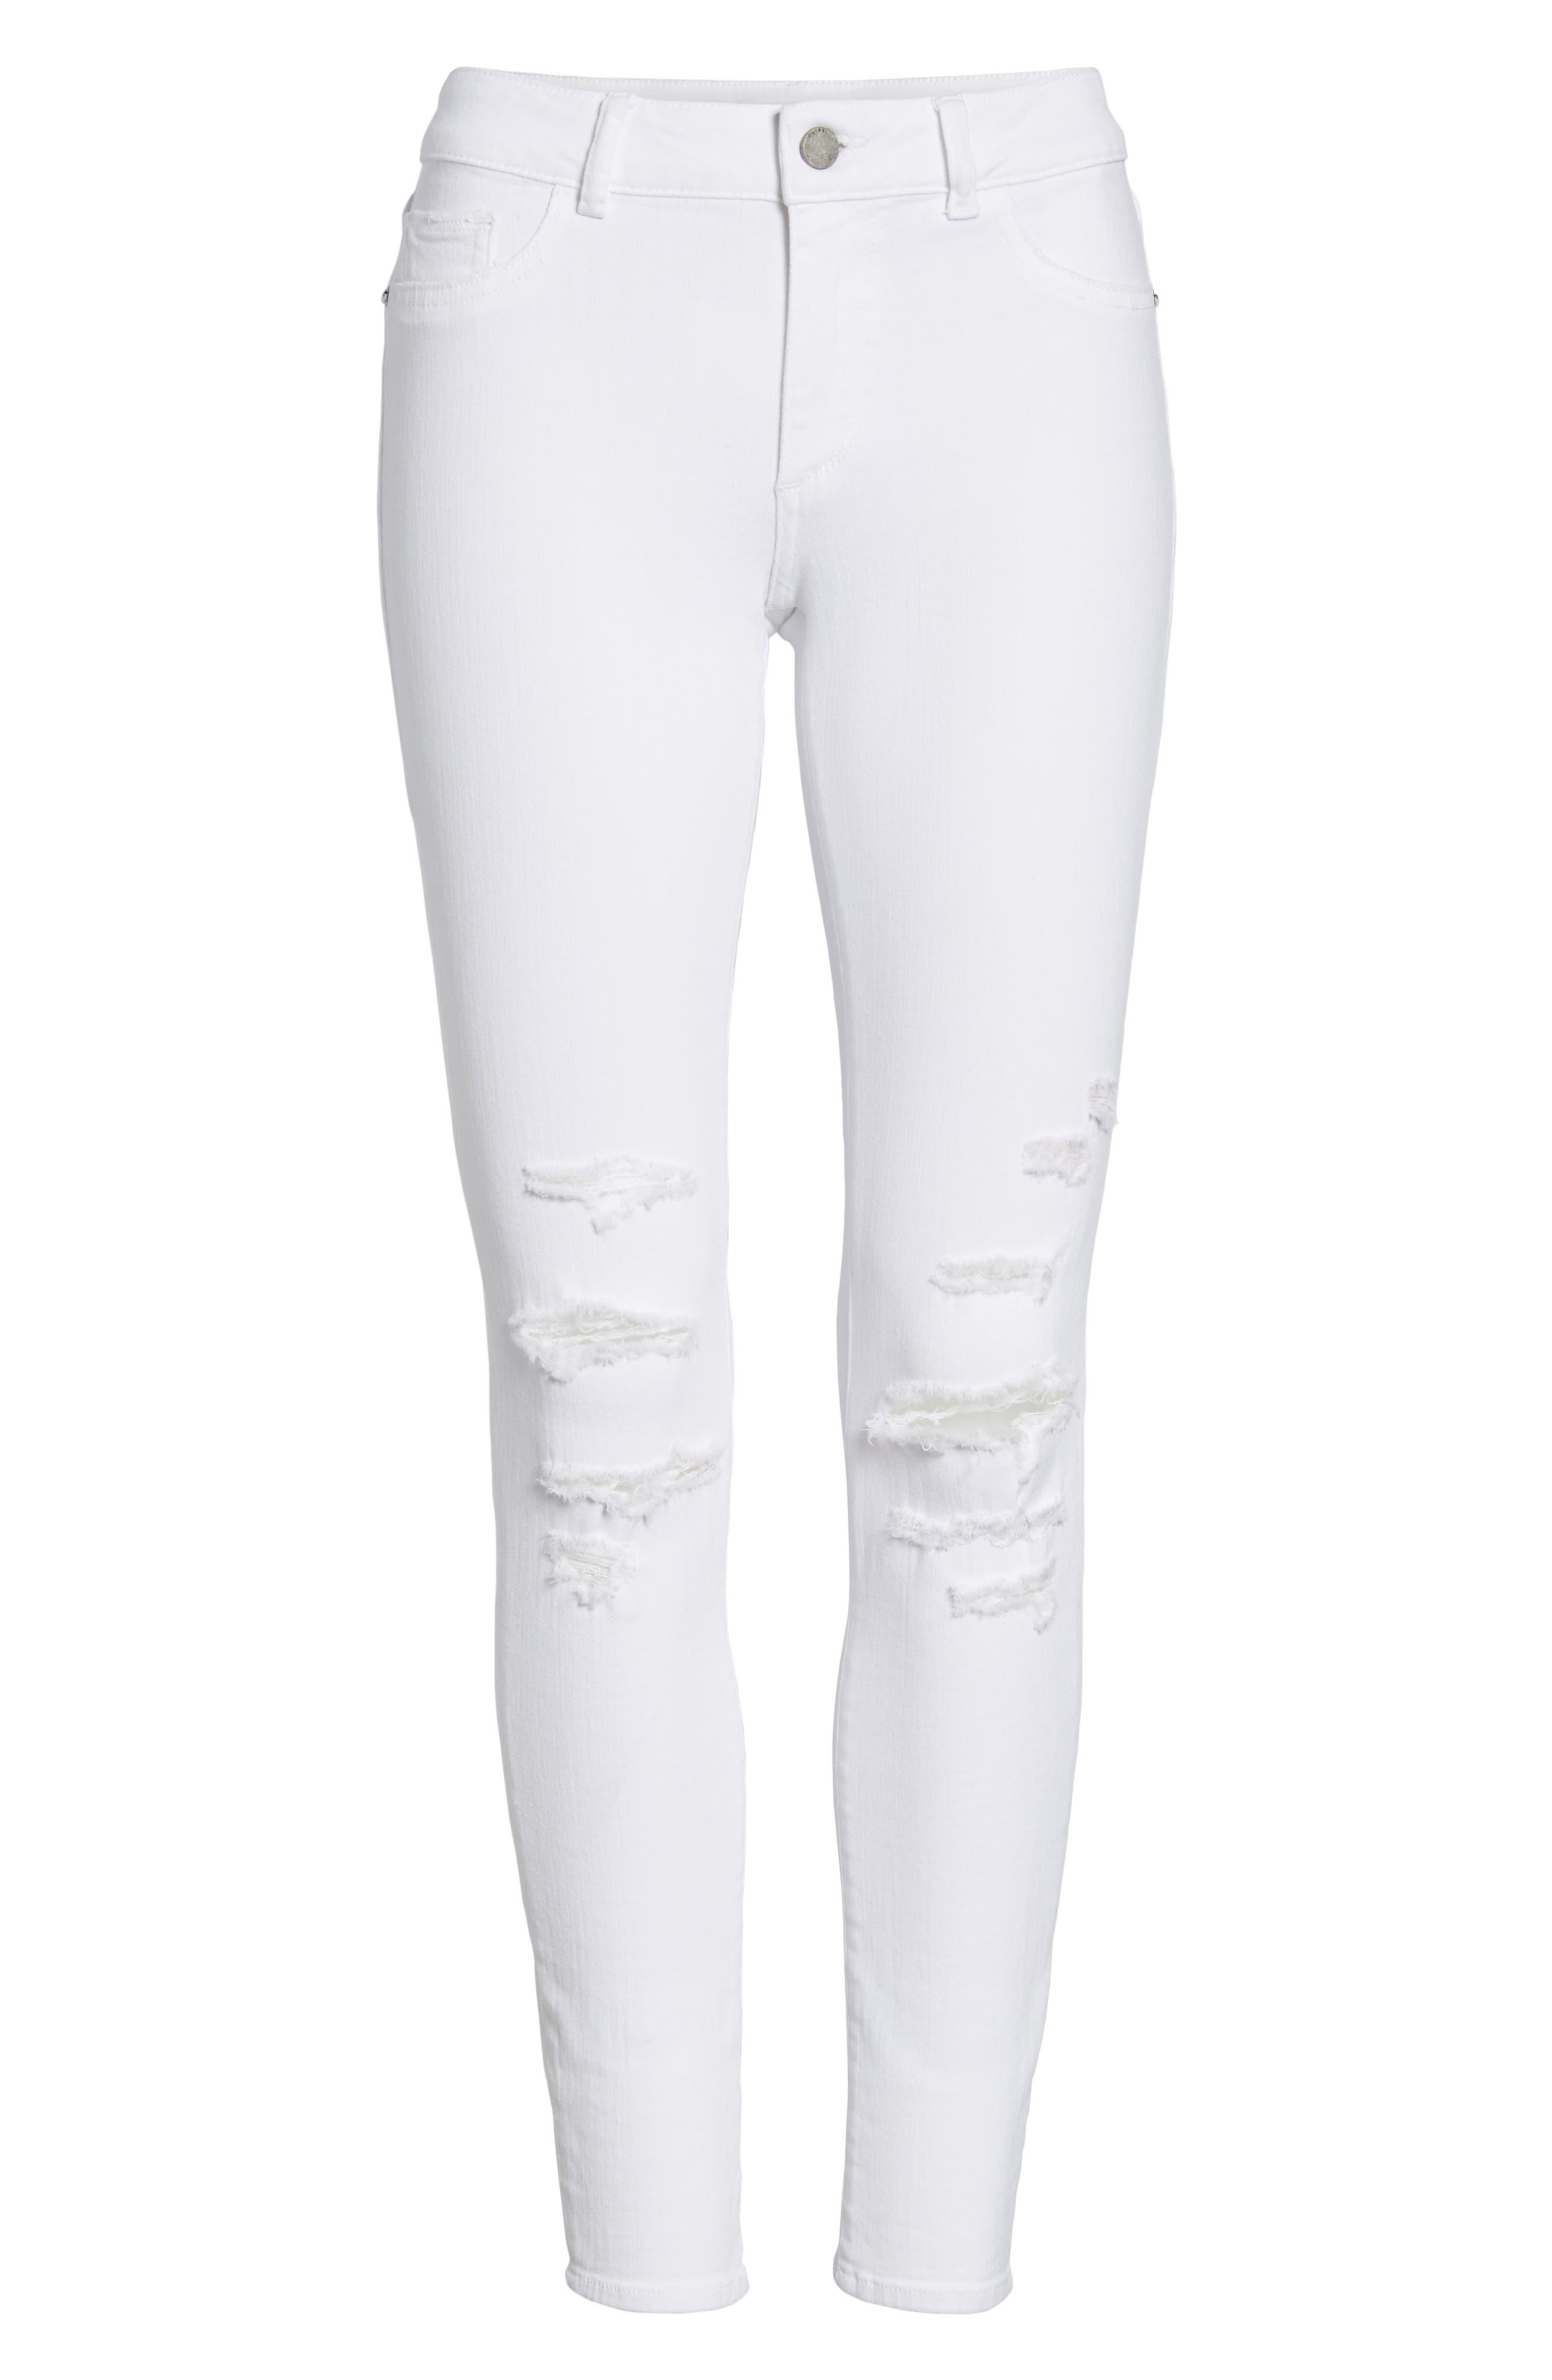 Emma Power Legging Jeans,                             Alternate thumbnail 7, color,                             Dawson